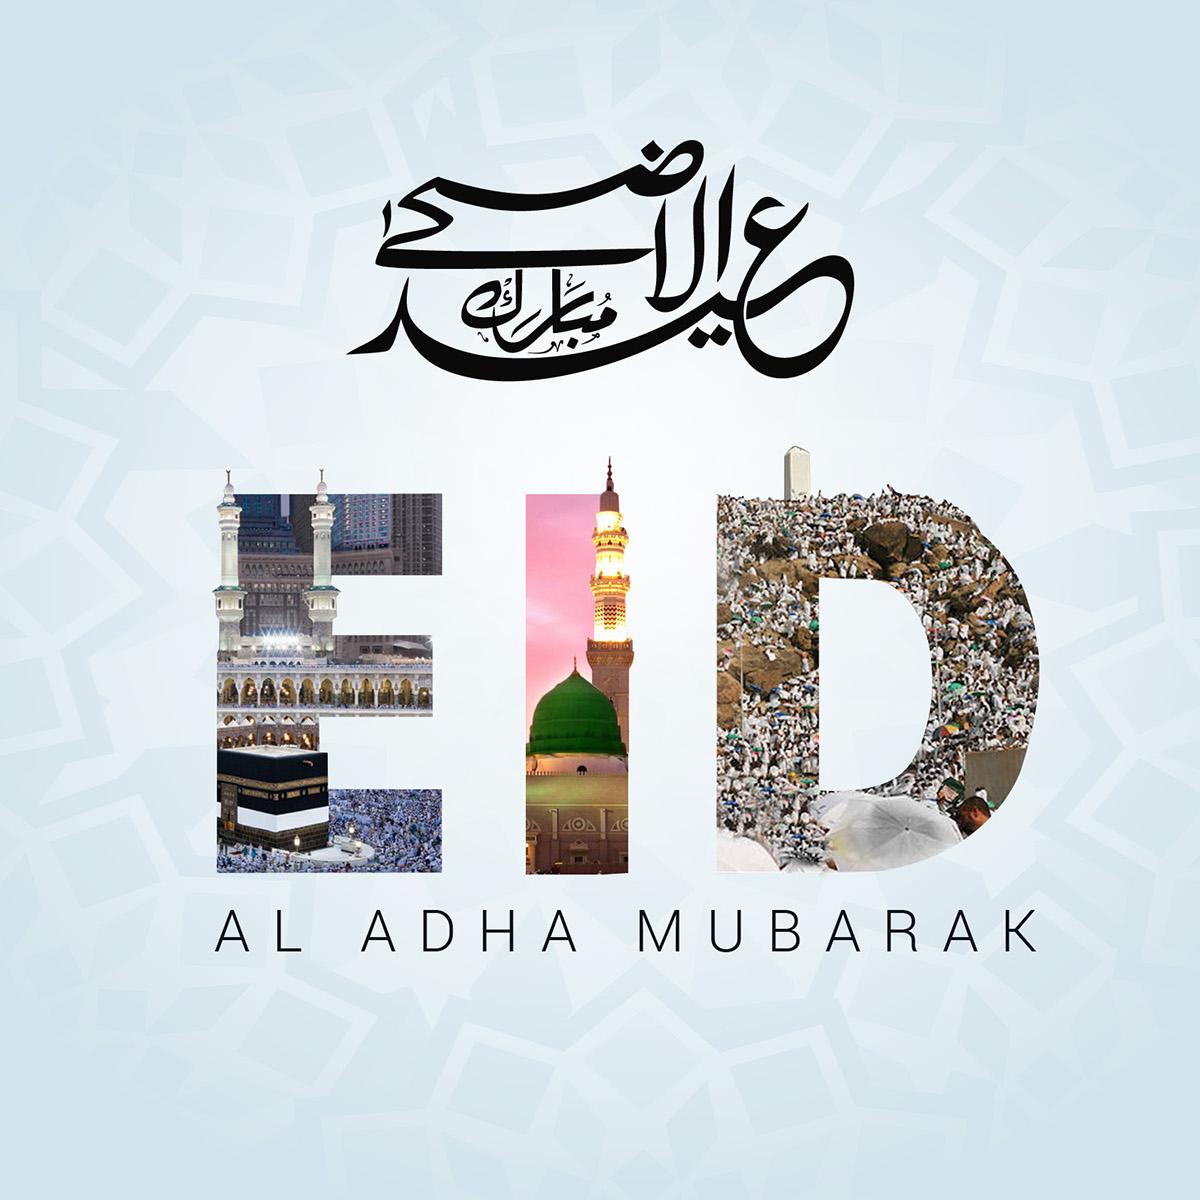 Happy Eid ul adha Wishes - Quotes - Status images